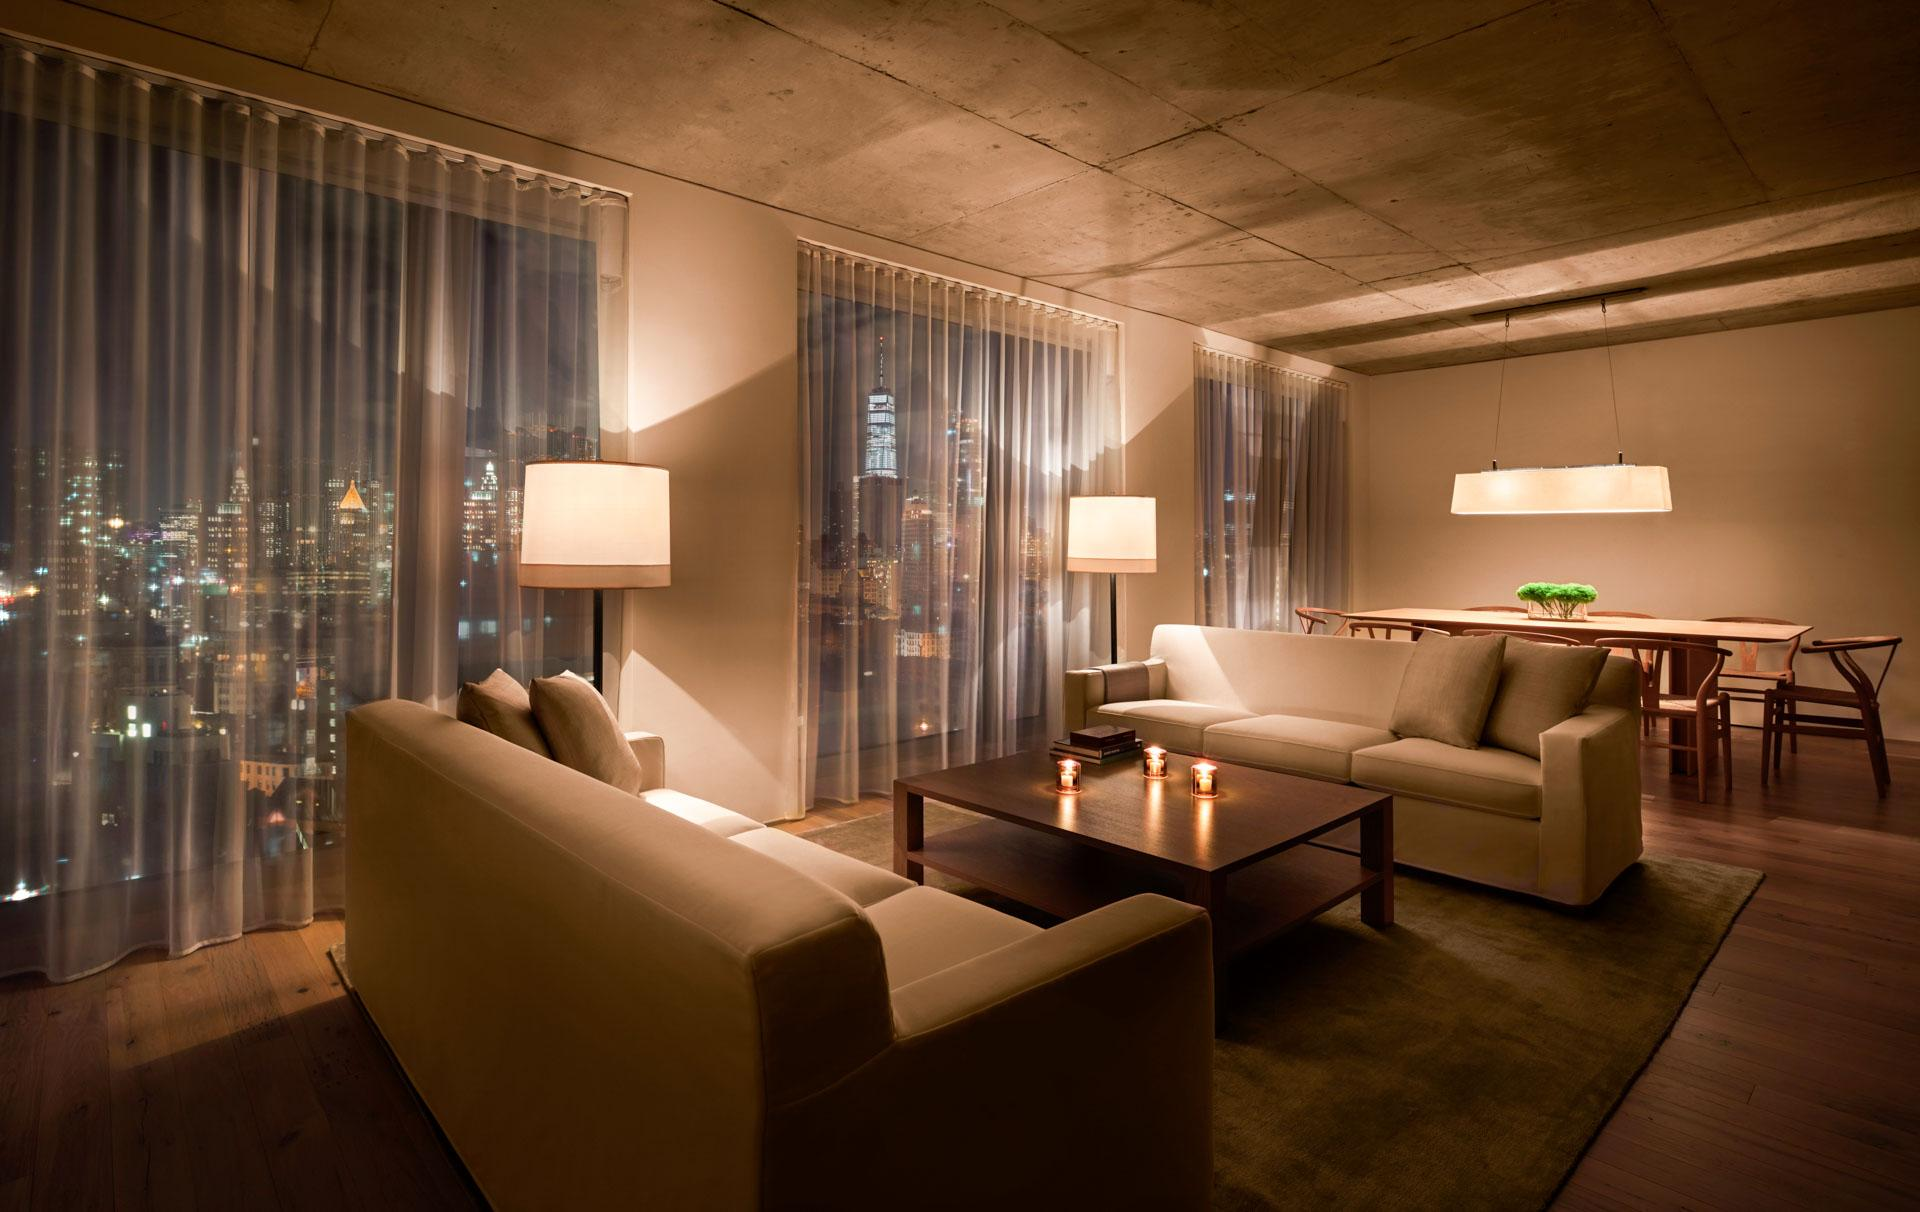 09-PUBLIC Hotel New York City - Suite- © Nicholas Koenig.jpg